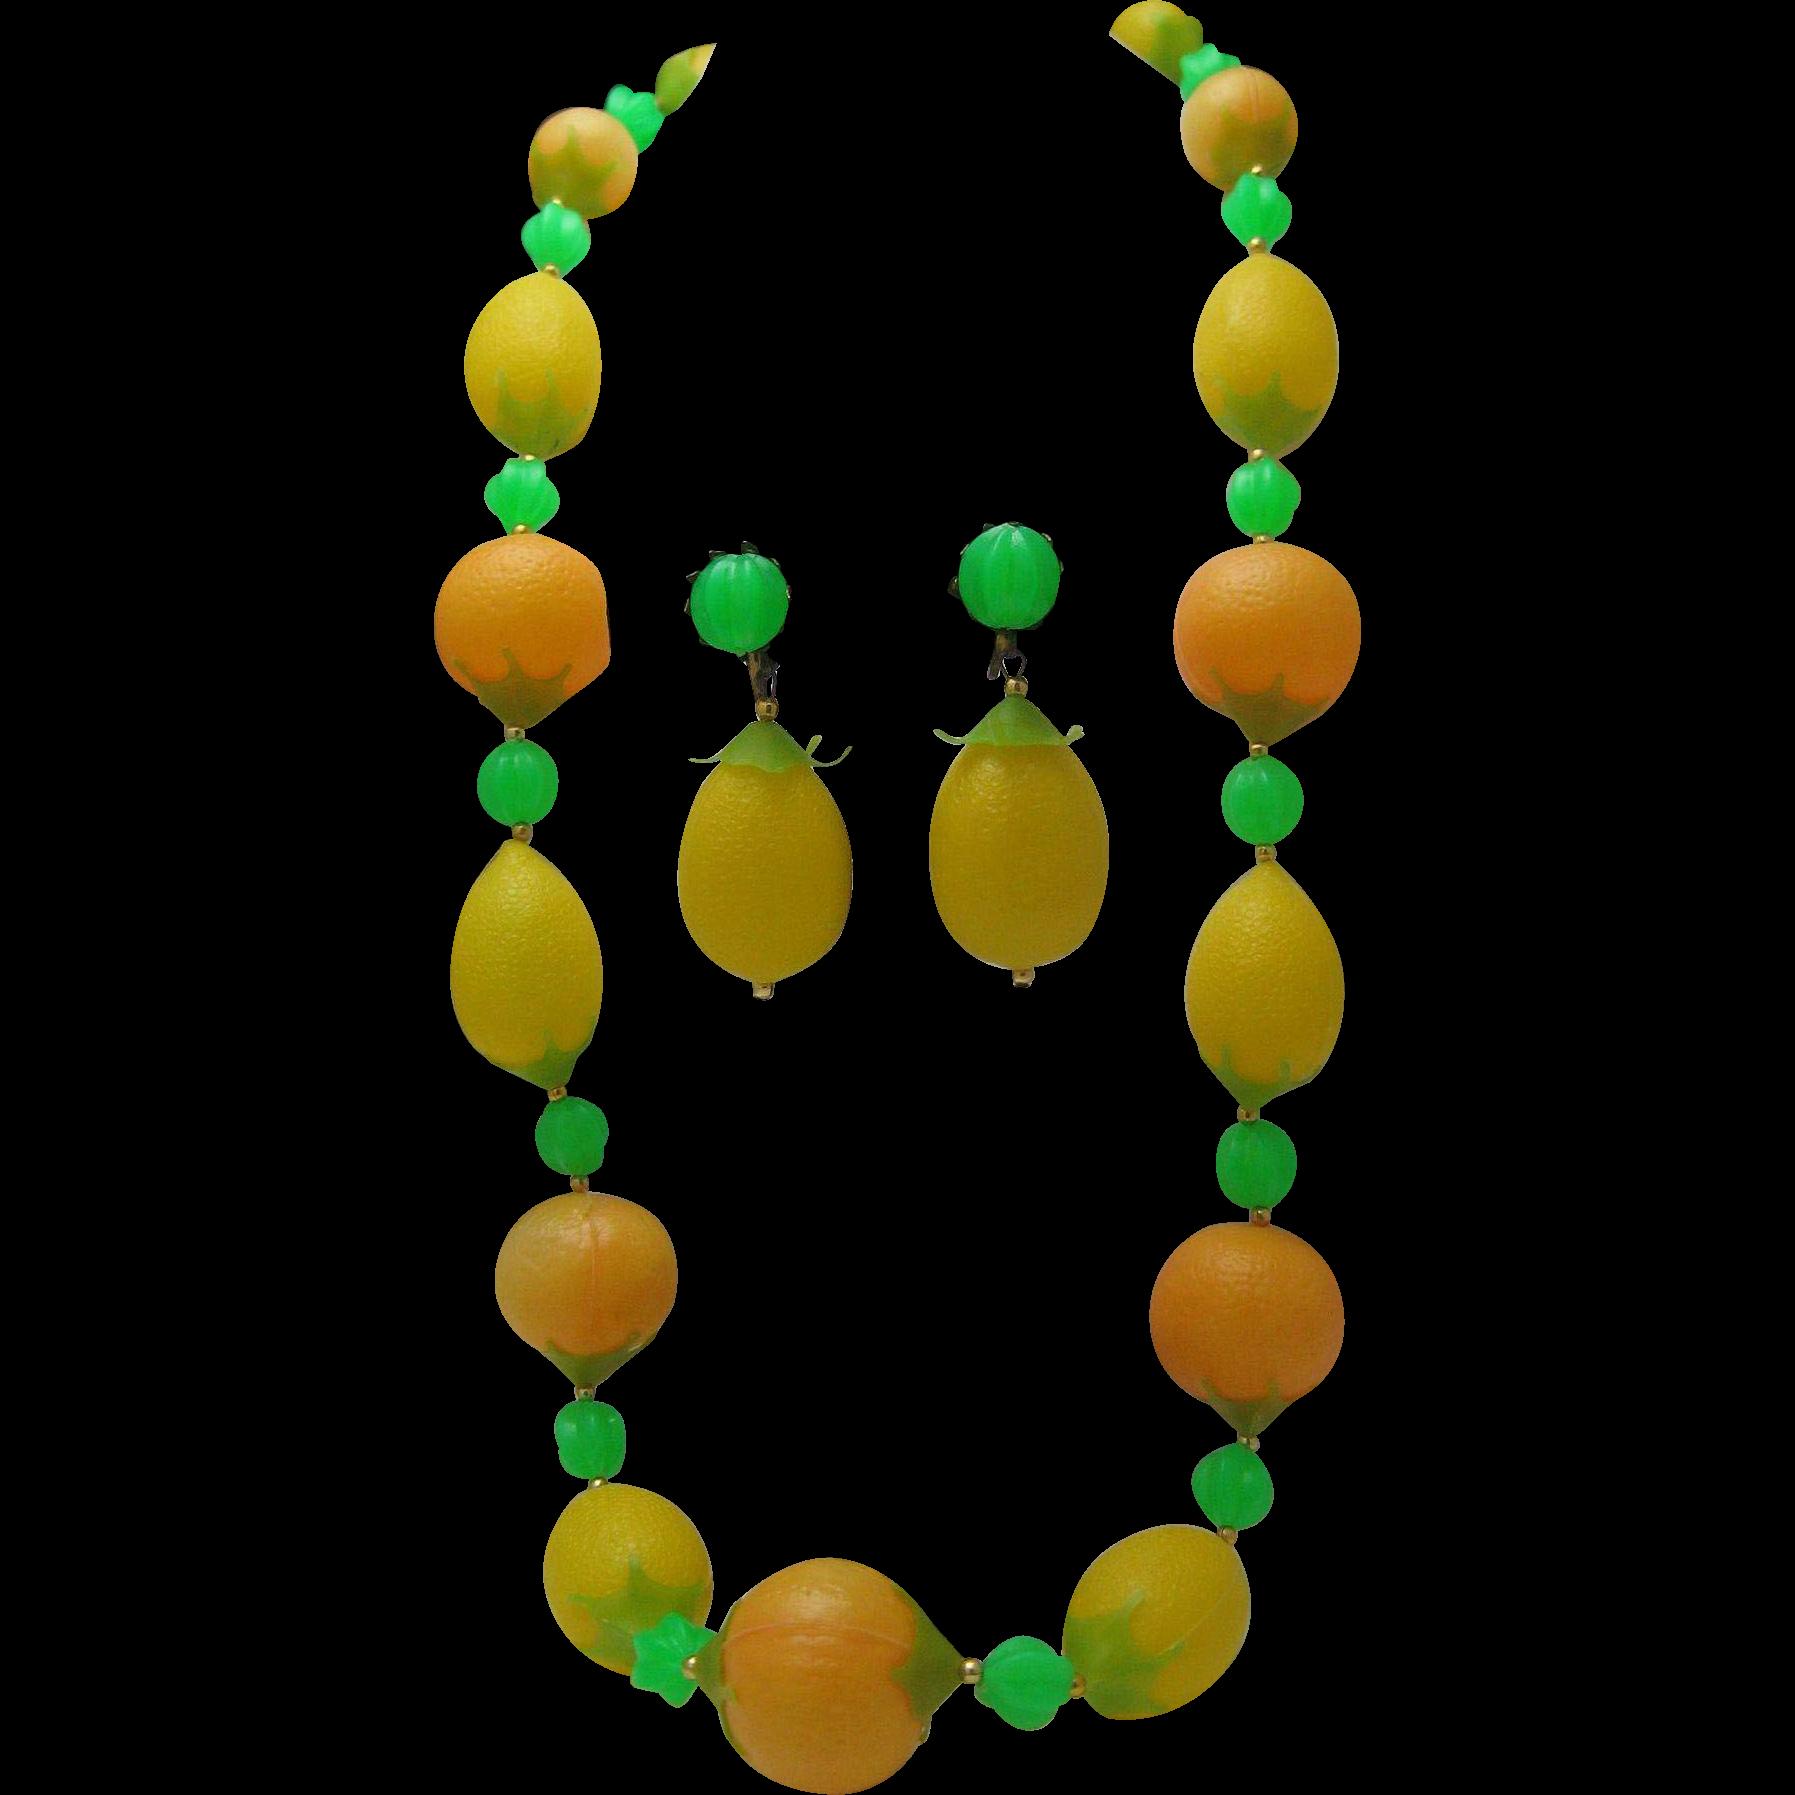 Lemon Lime Orange Necklace Earrings c1960